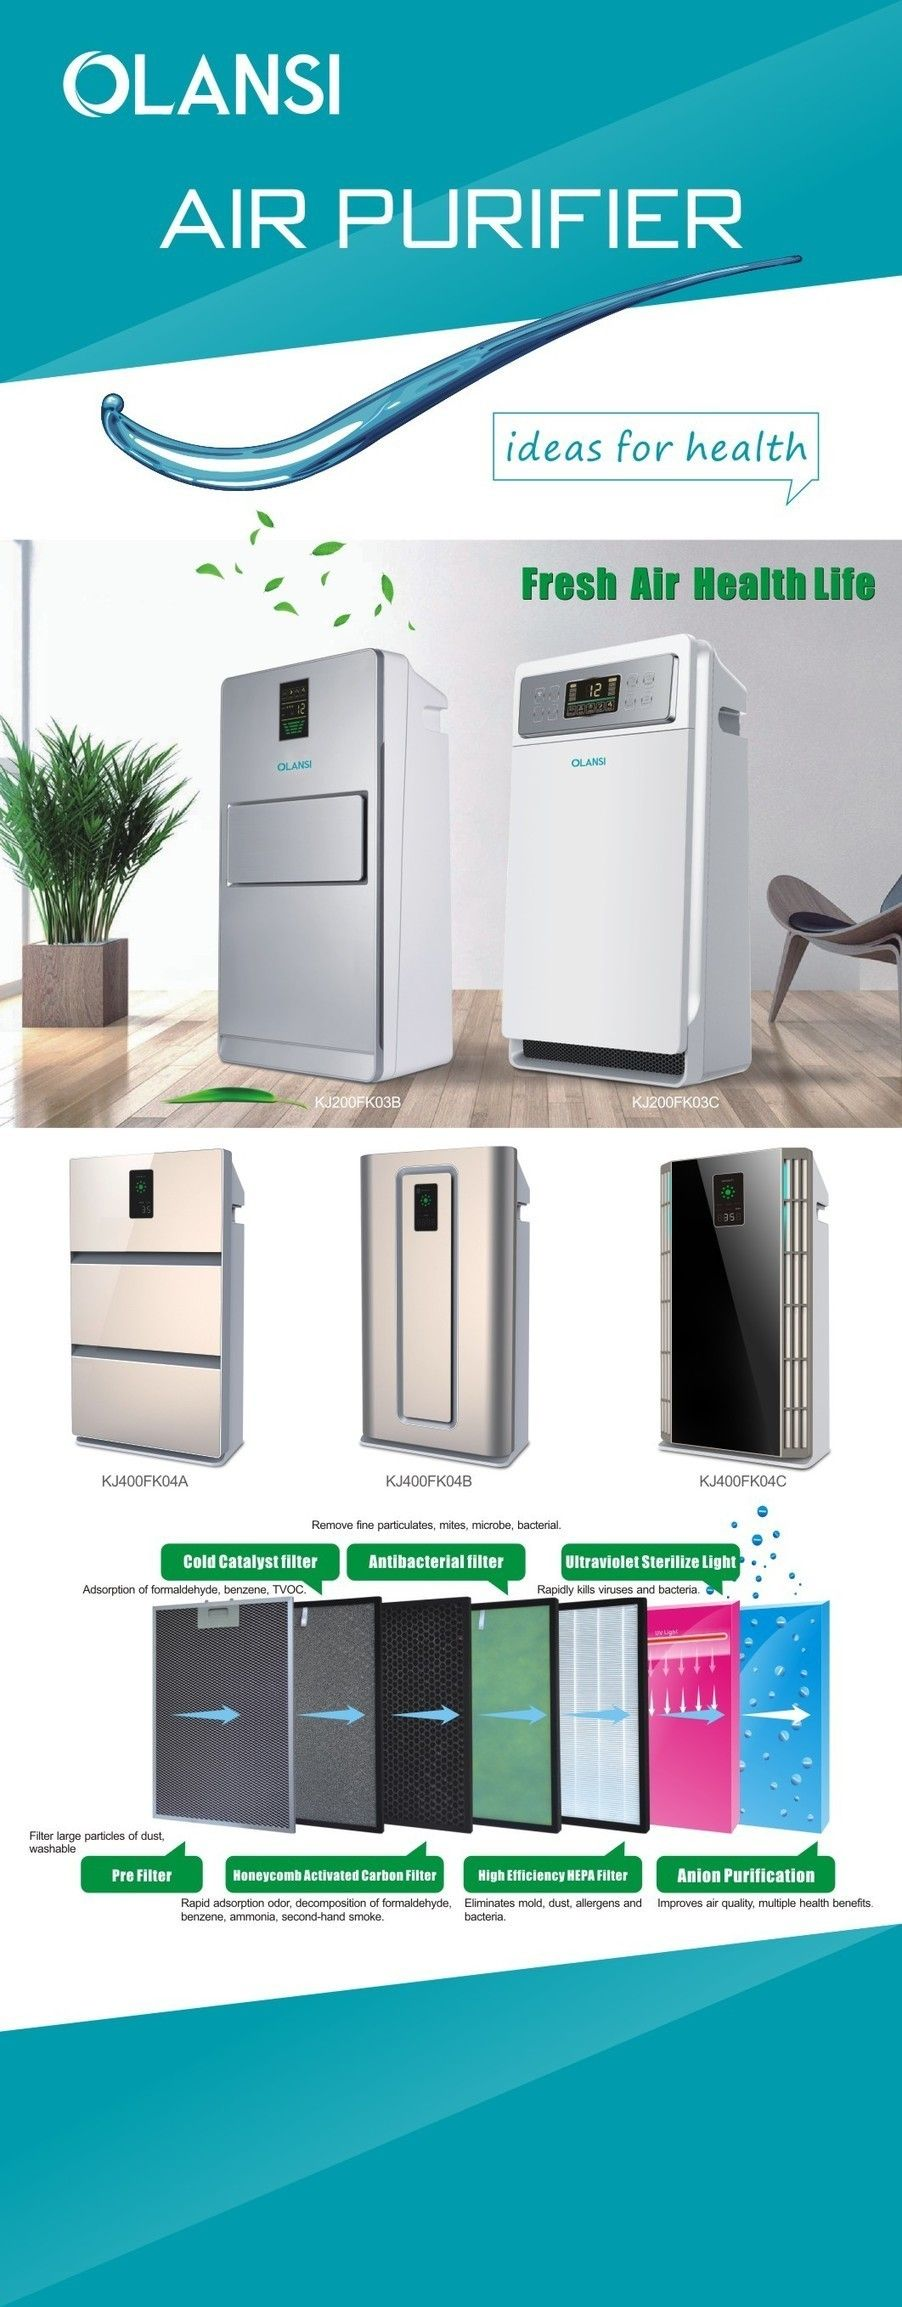 Clean Air Purifier Air purifier, Home air purifier